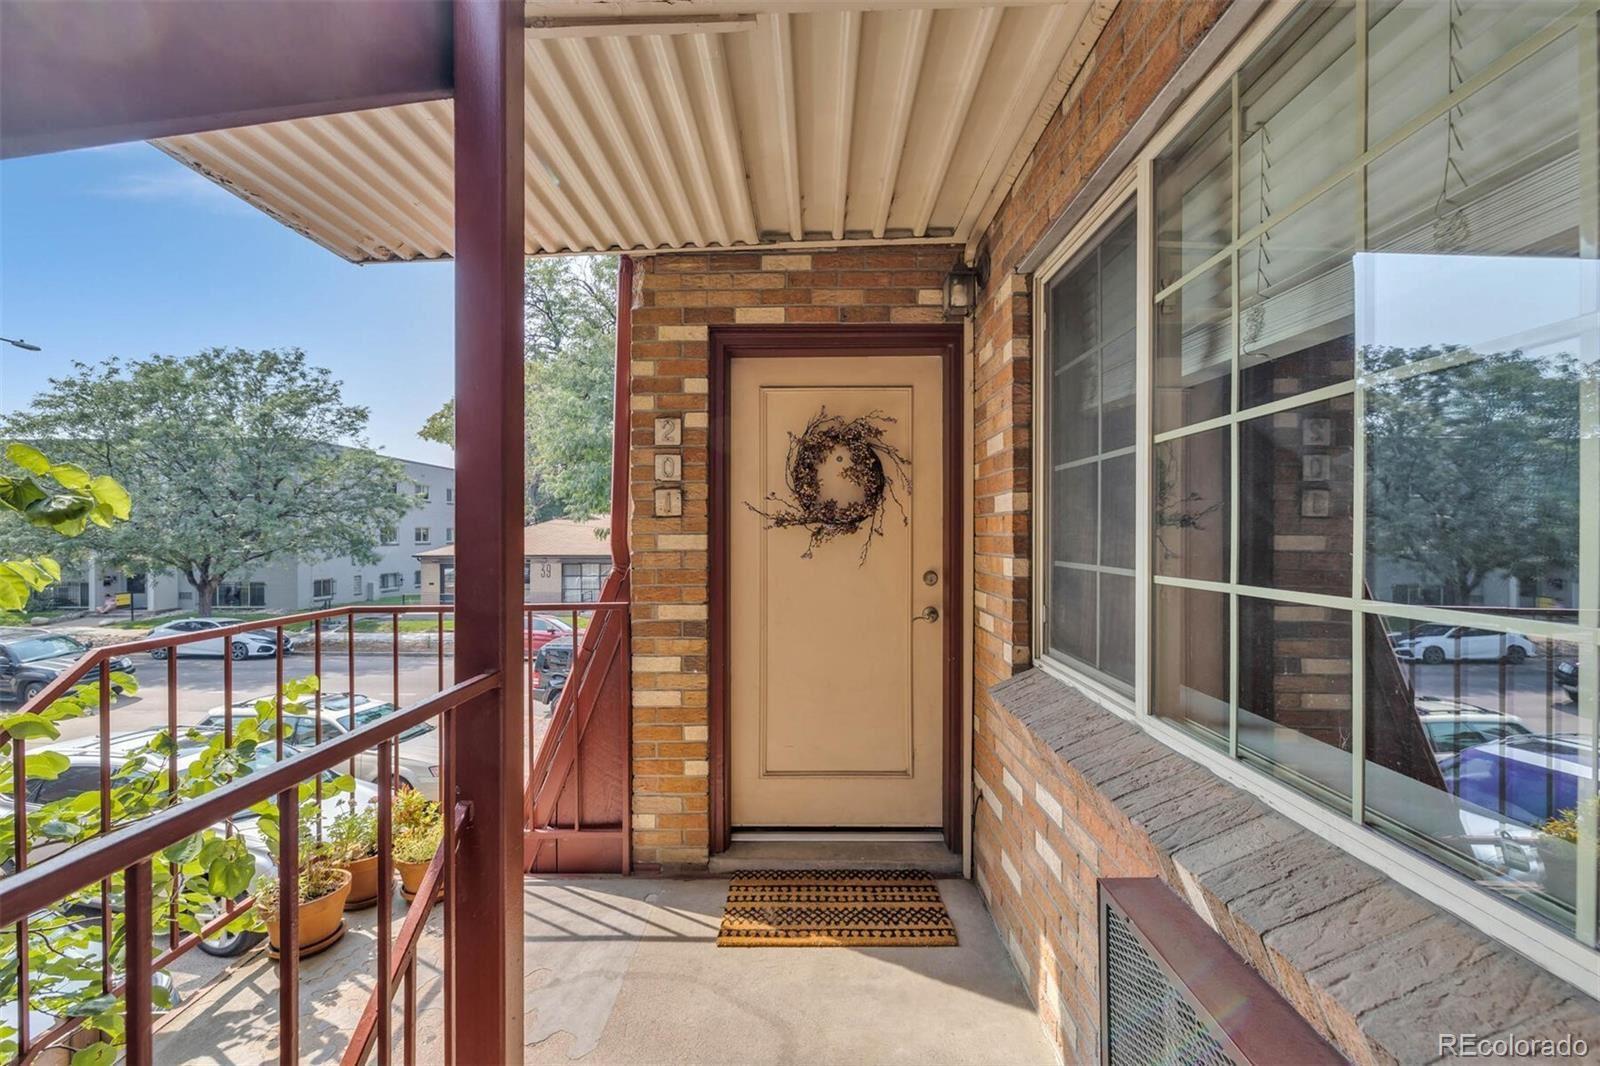 Photo of 36 N Emerson Street #201, Denver, CO 80218 (MLS # 5388785)